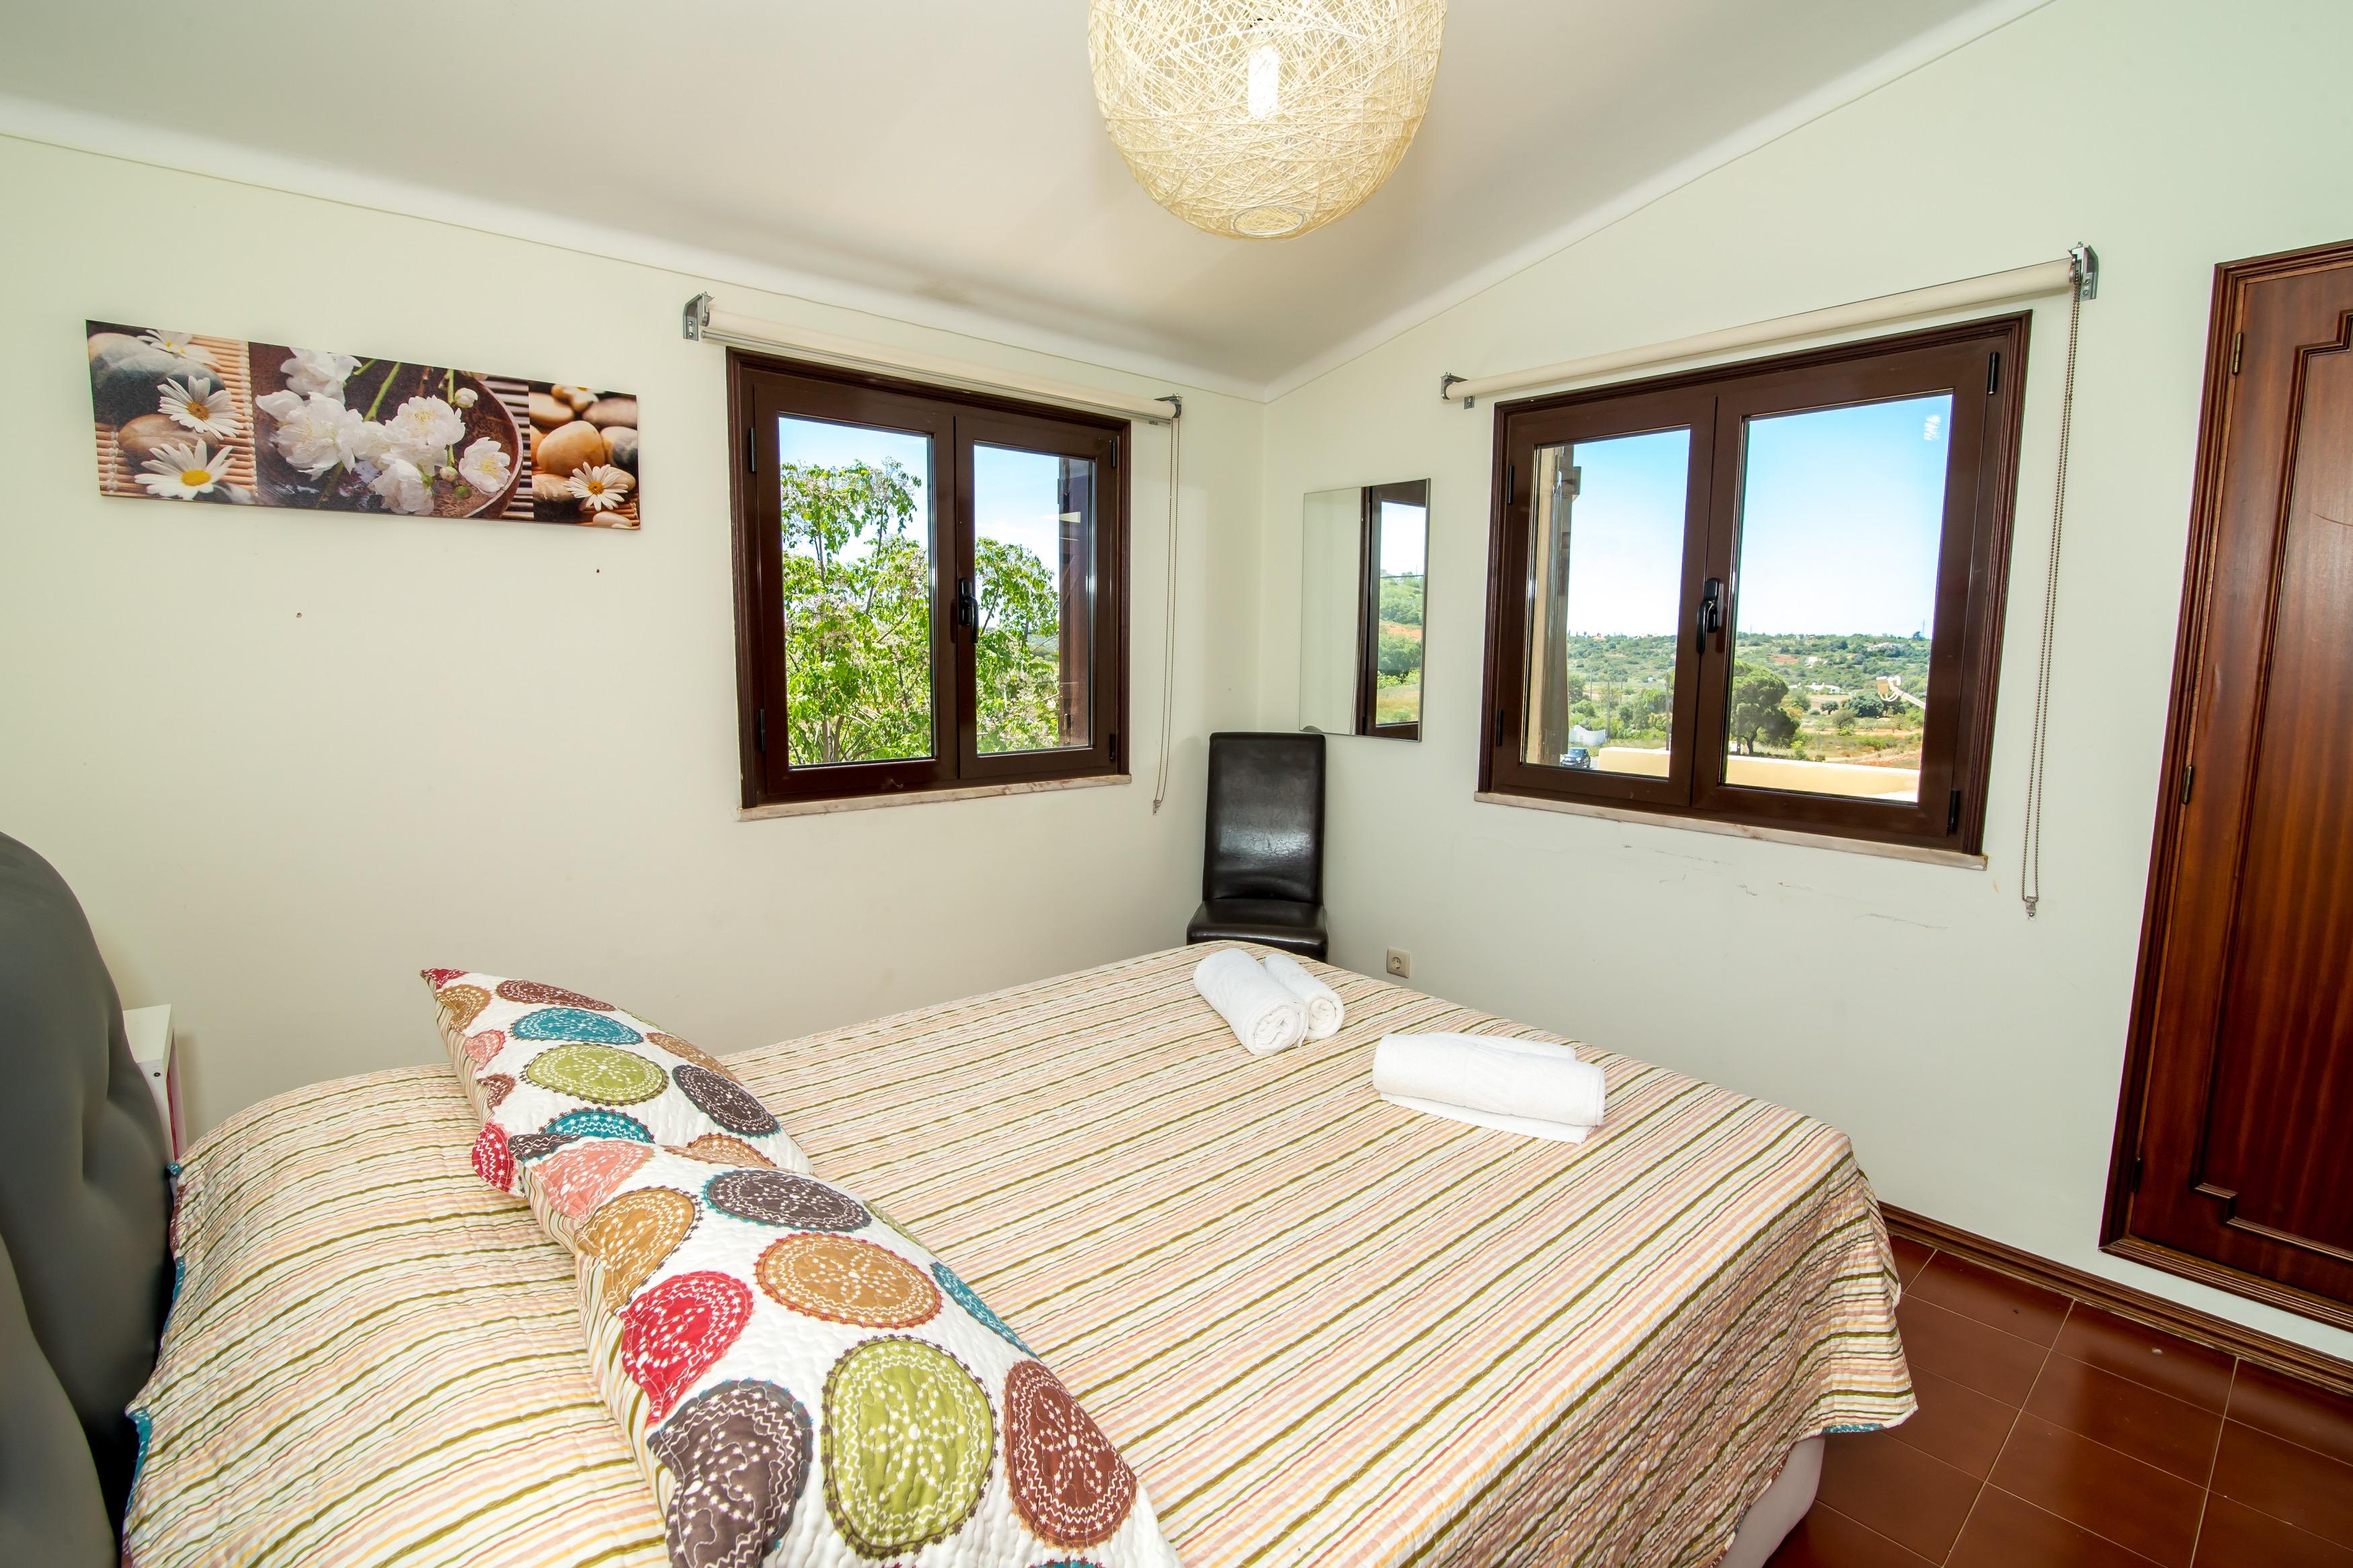 Location appartements et villas de vacance, Villa Barrancos à Guia, Portugal Algarve, REF_IMG_5770_5784